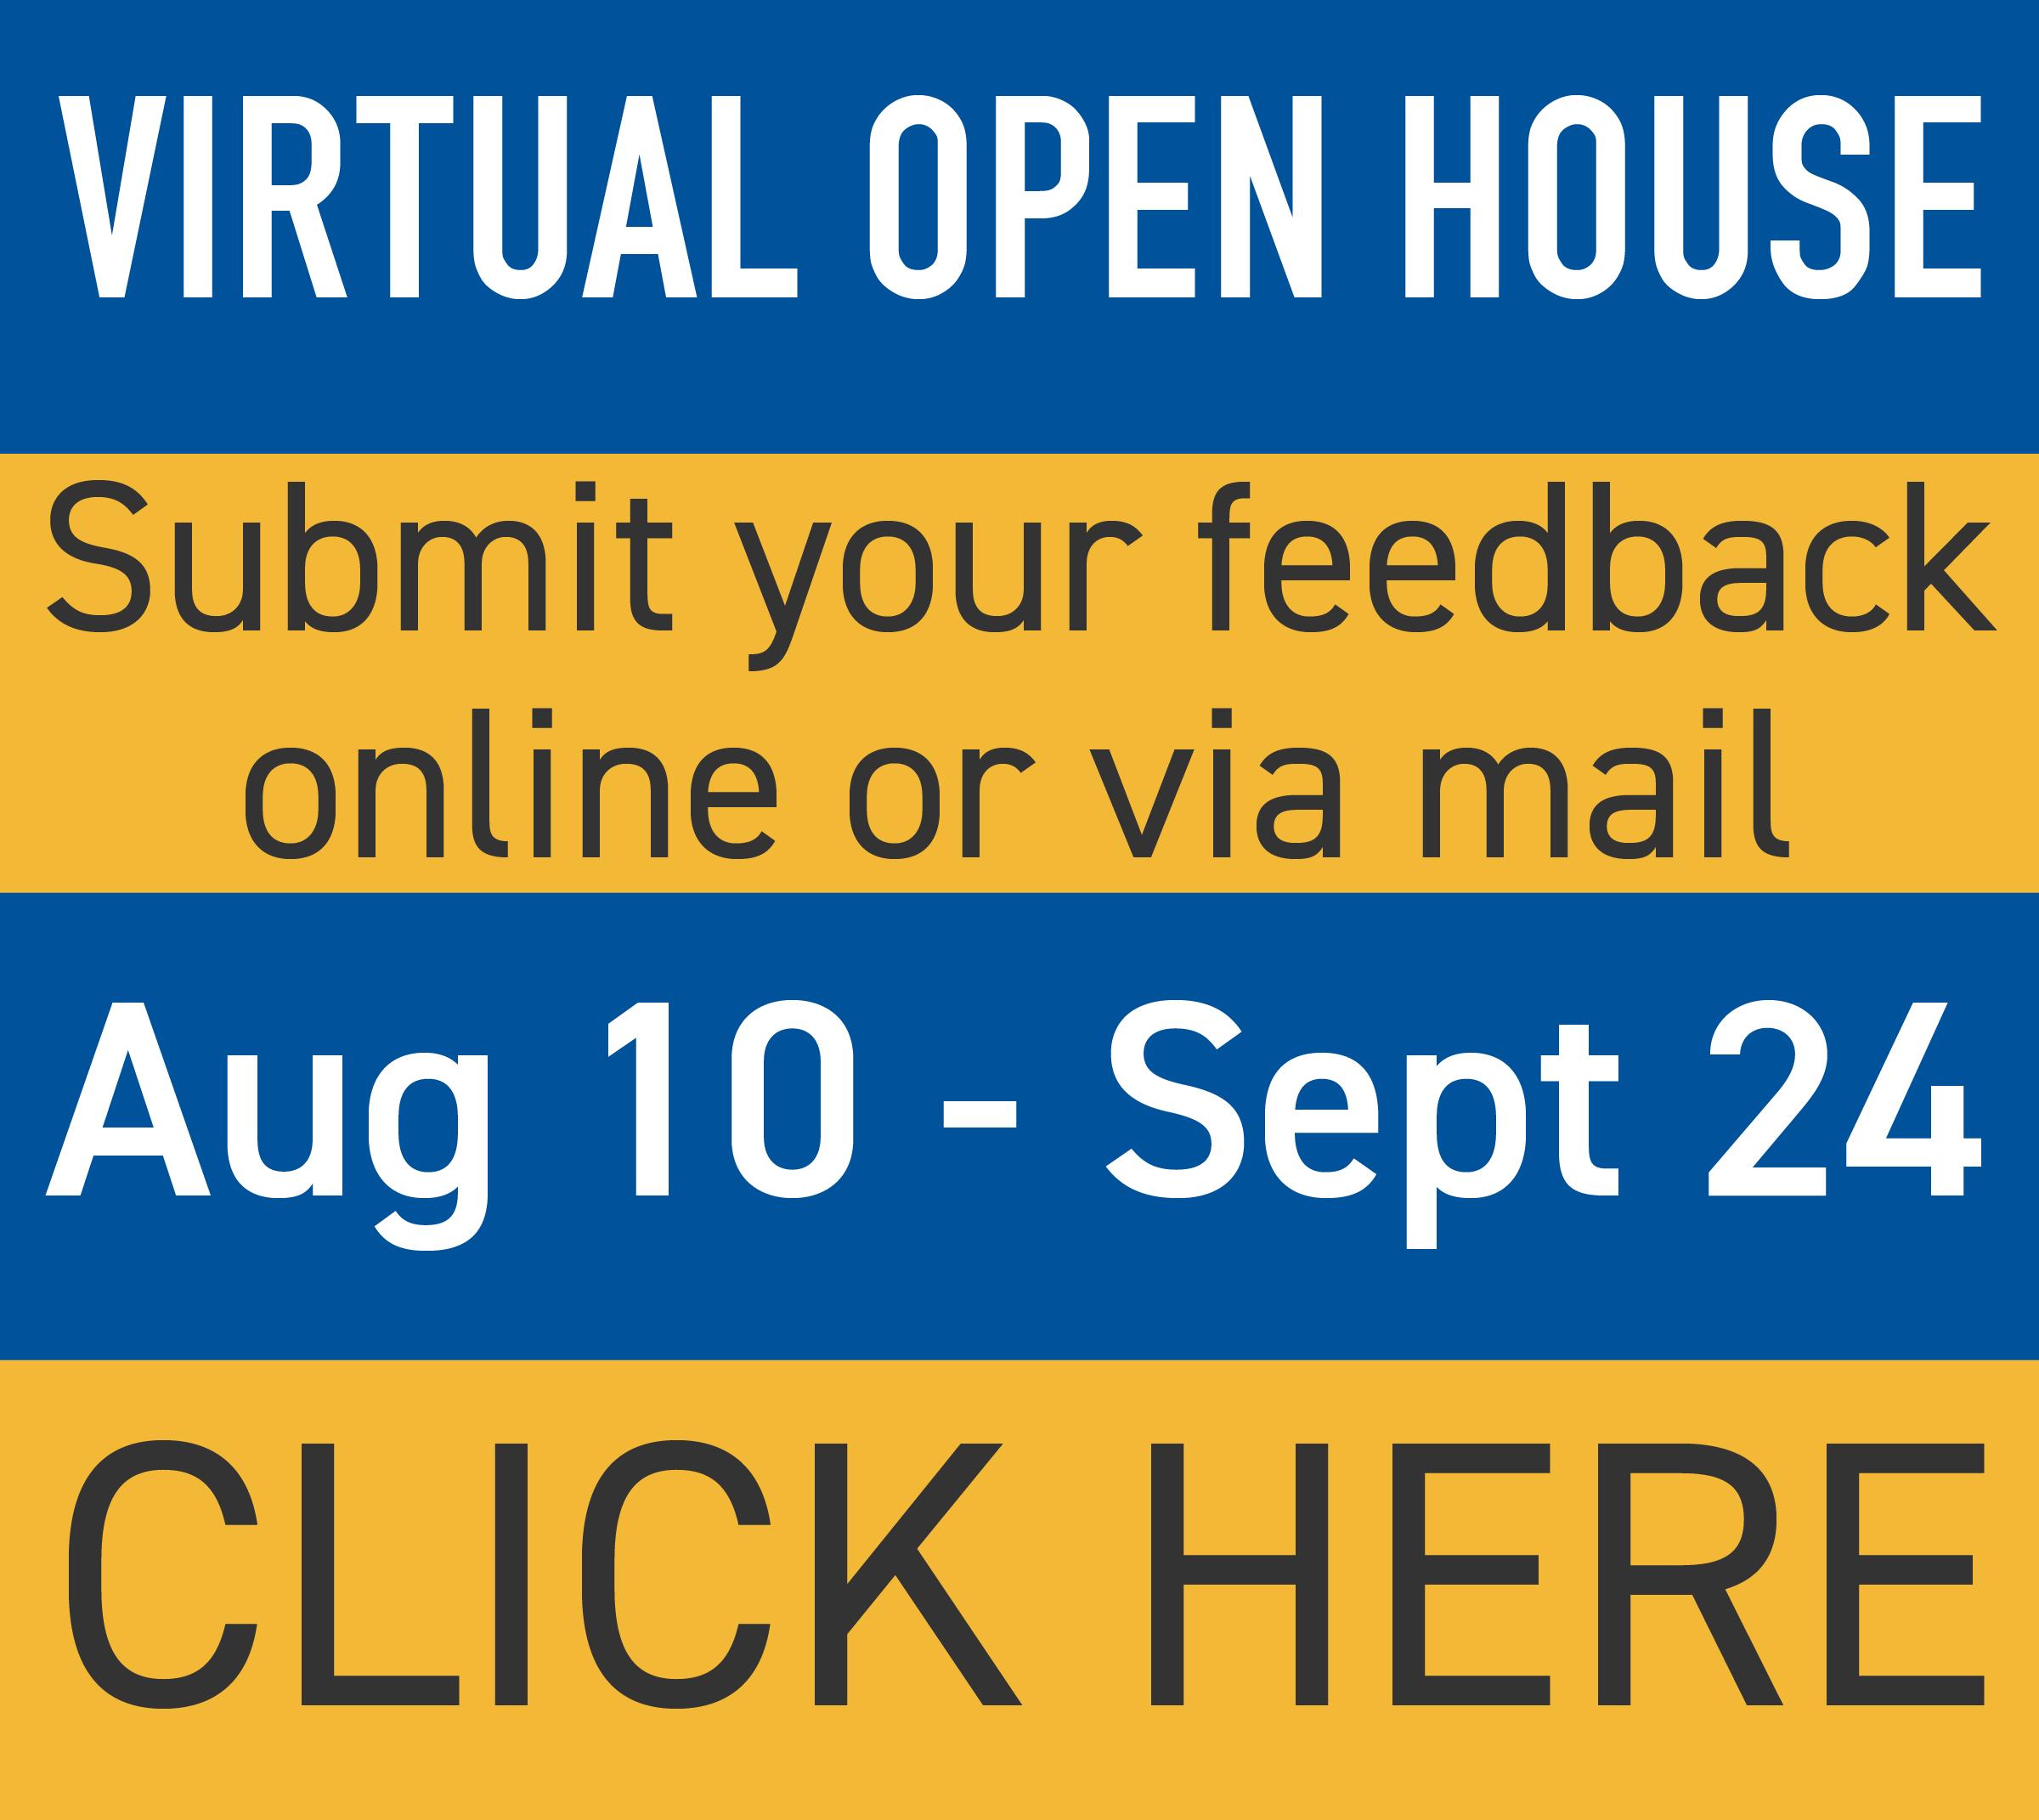 I-35 Virtual Open House